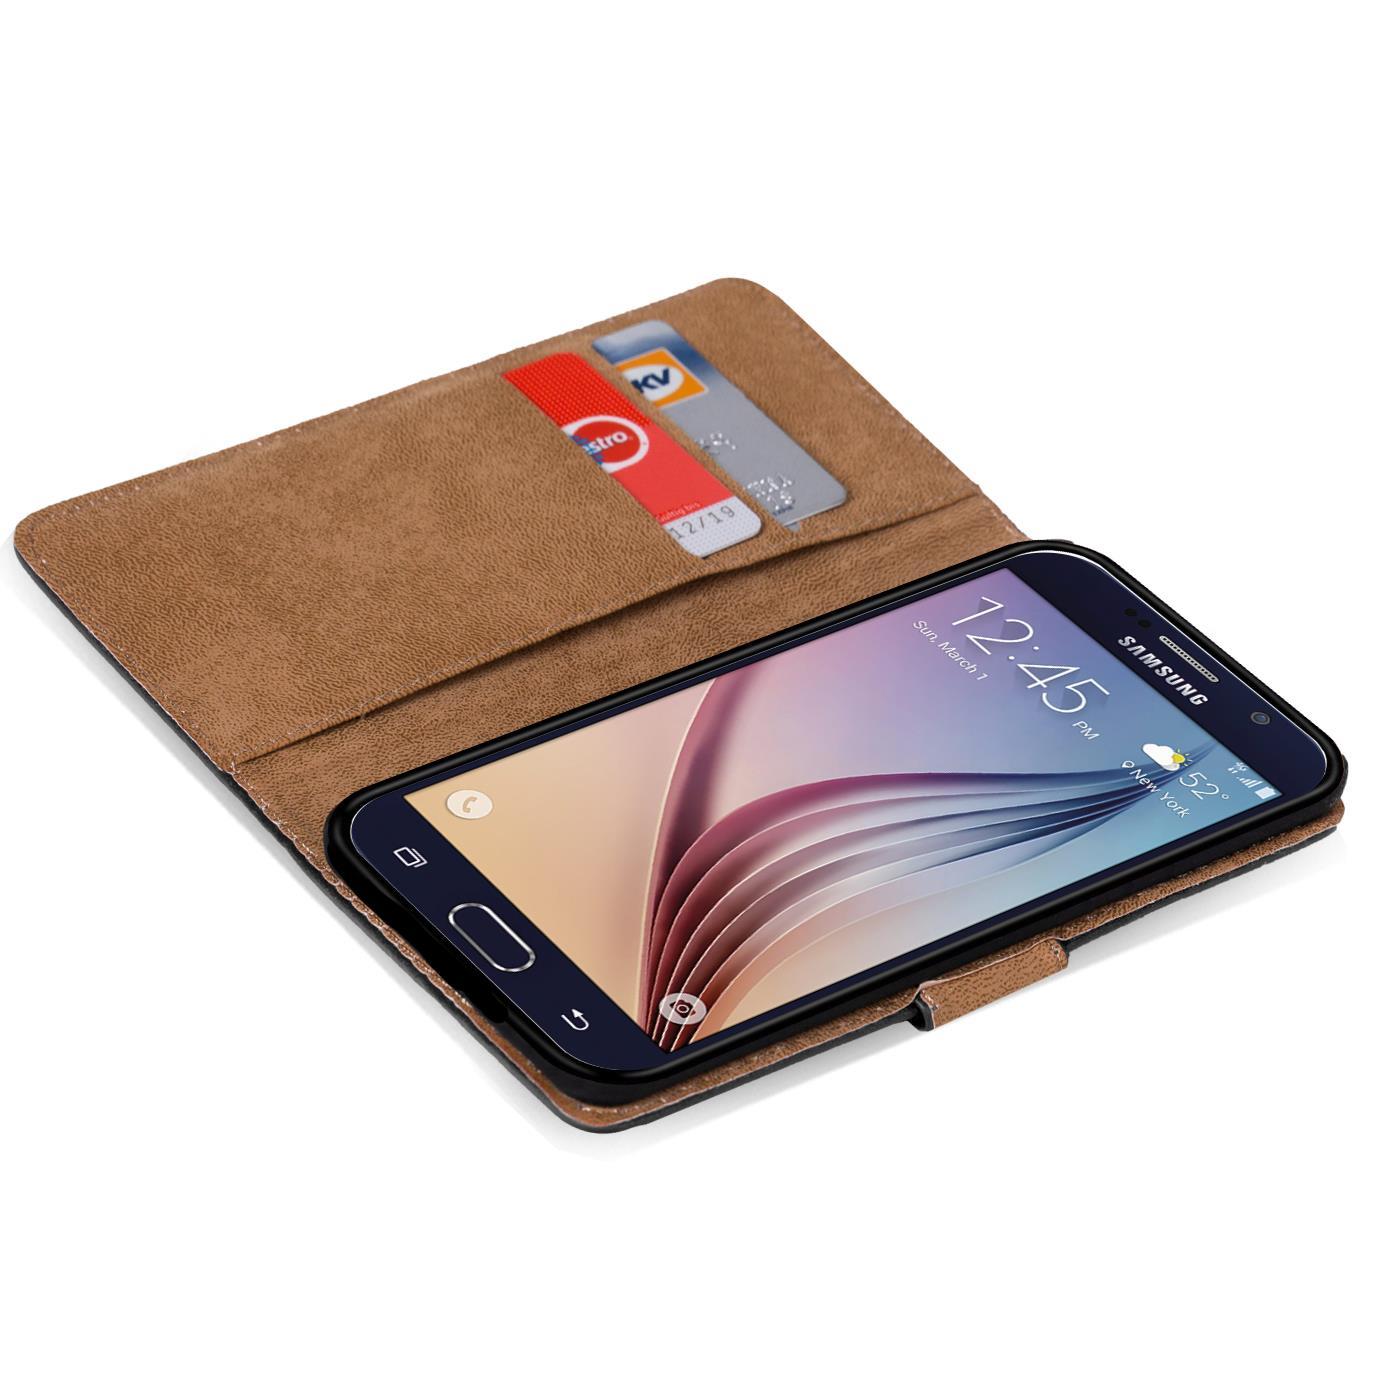 Book-Case-Samsung-Galaxy-s6-edge-Plus-Sac-etui-Flip-Cover-pour-Telephone-Portable-etui-Noir miniature 4